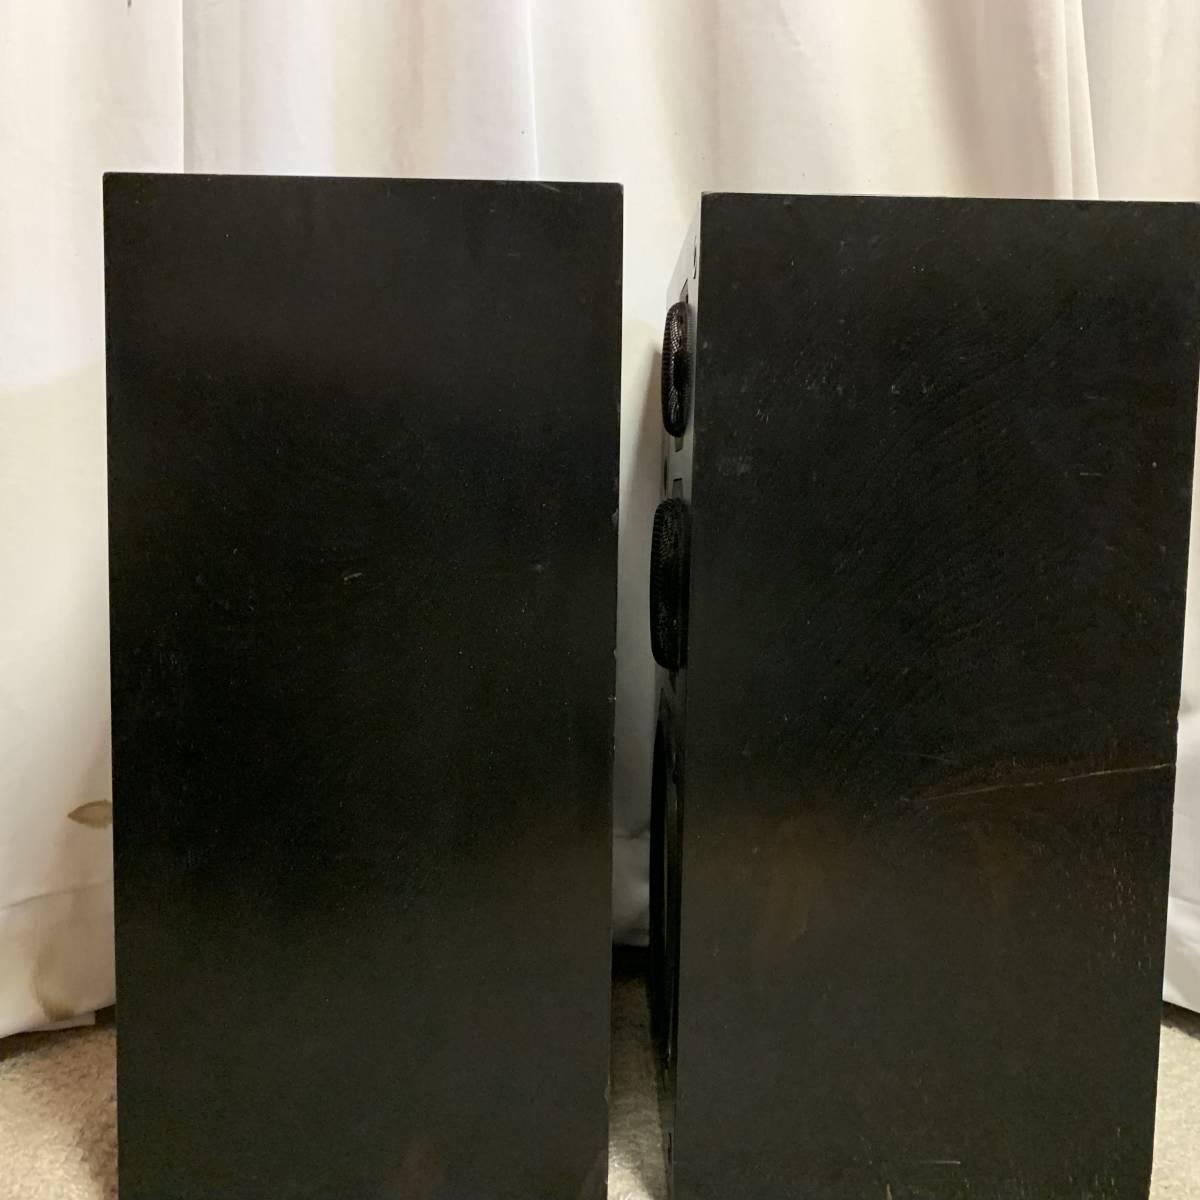 YAMAHA スピーカー NS-100M ペア定価 86,000円 完全動作品30日保証 比較的美品_画像9